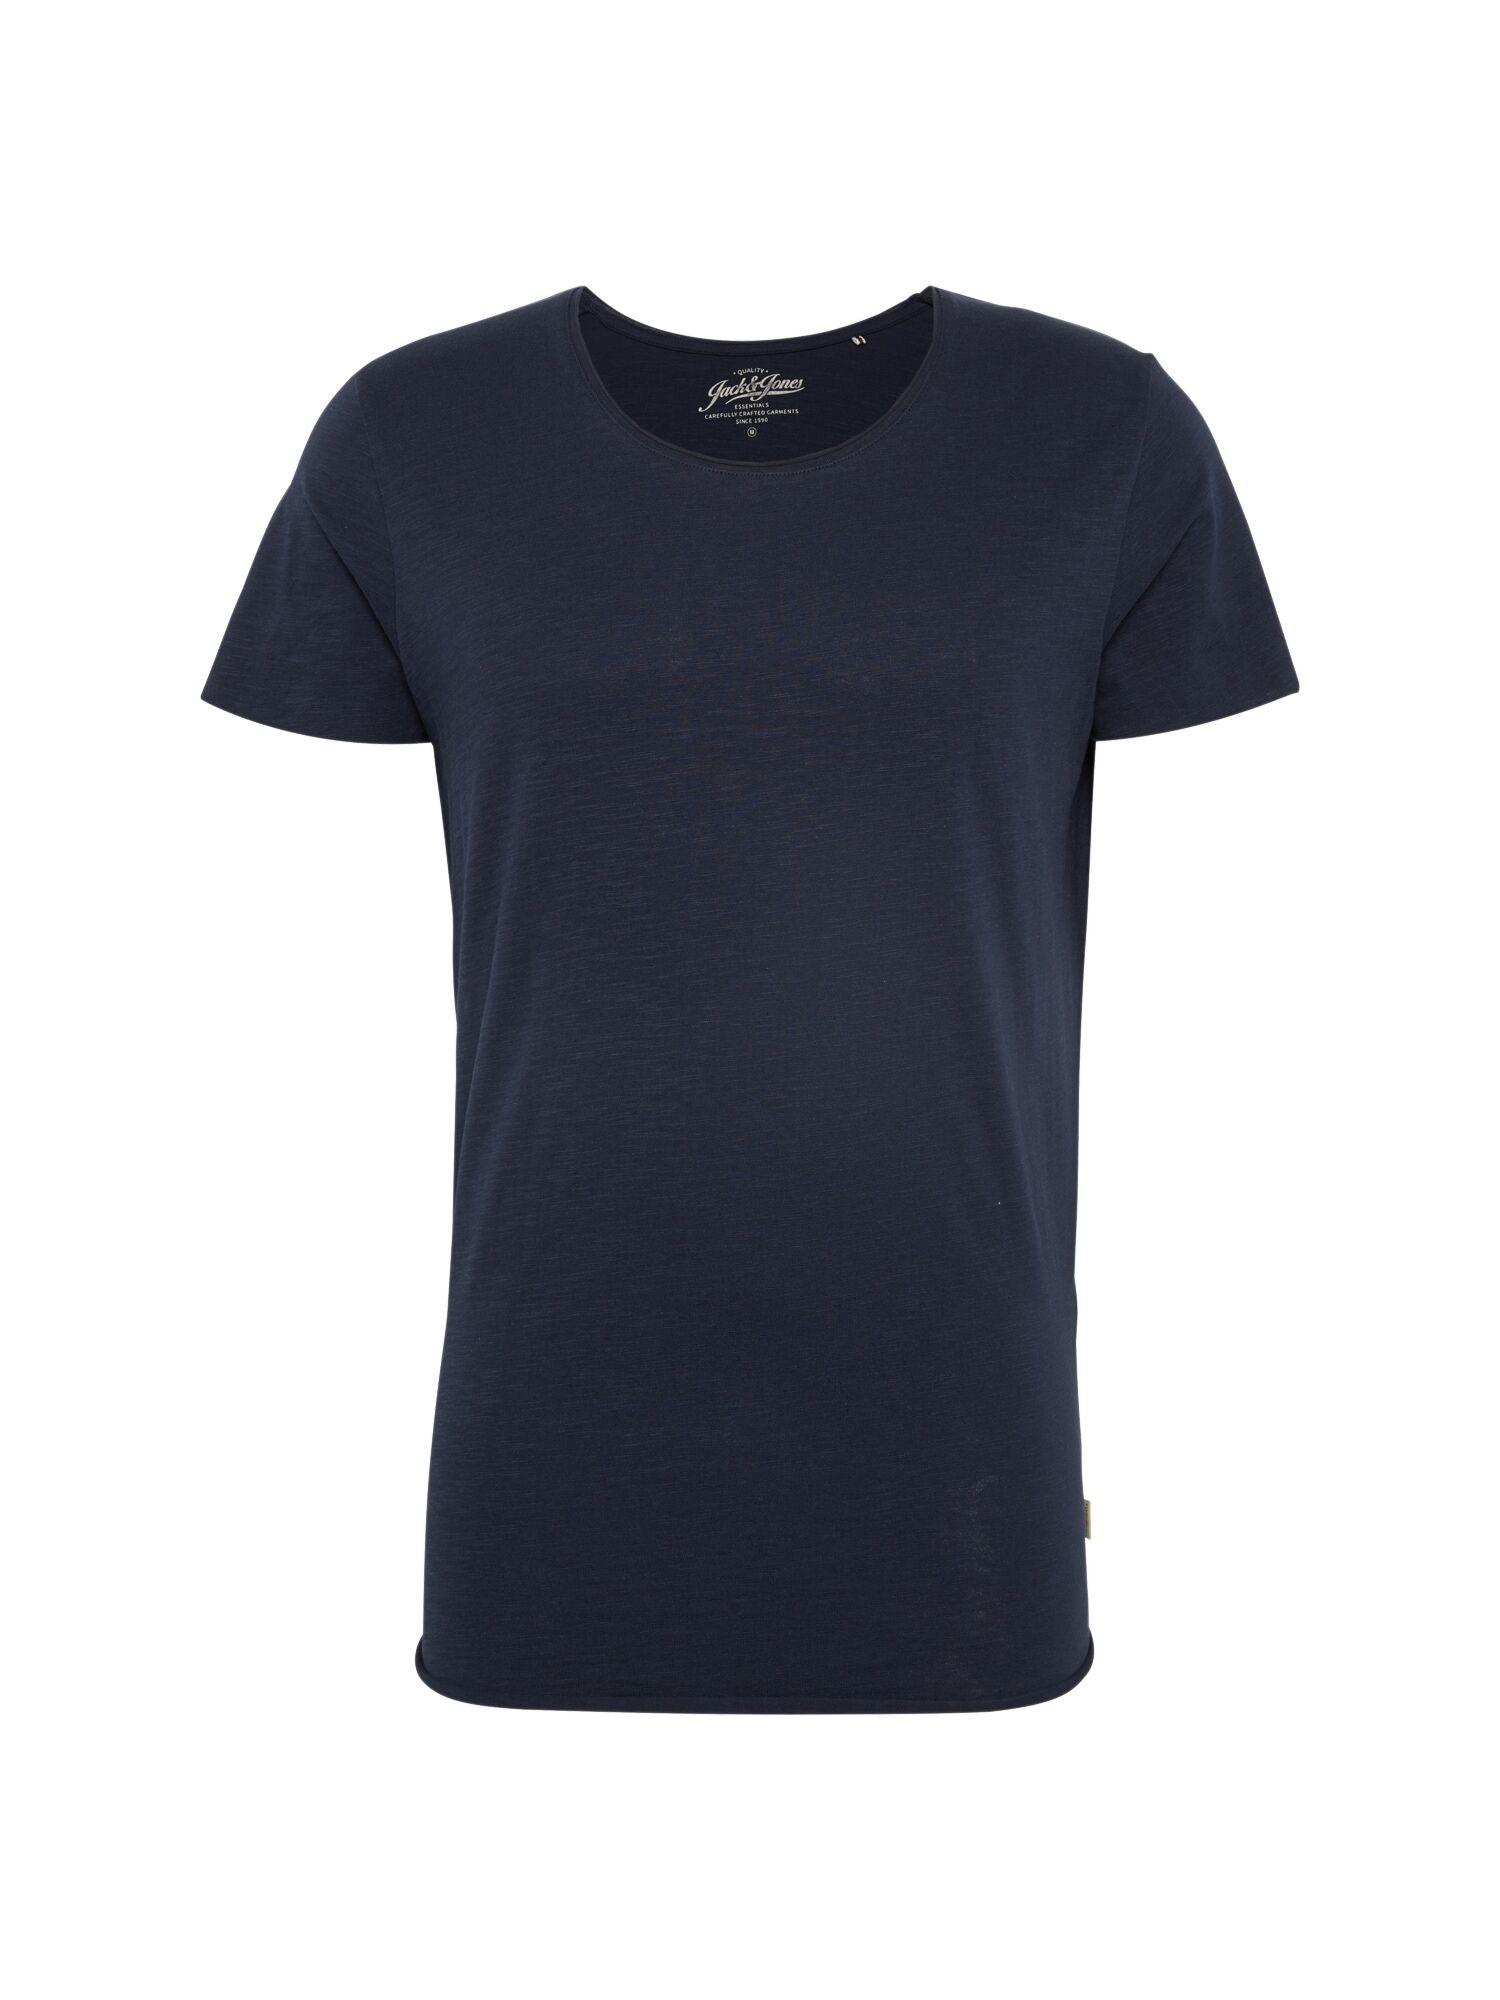 JACK & JONES T-Shirt  - Bleu - Taille: L - male